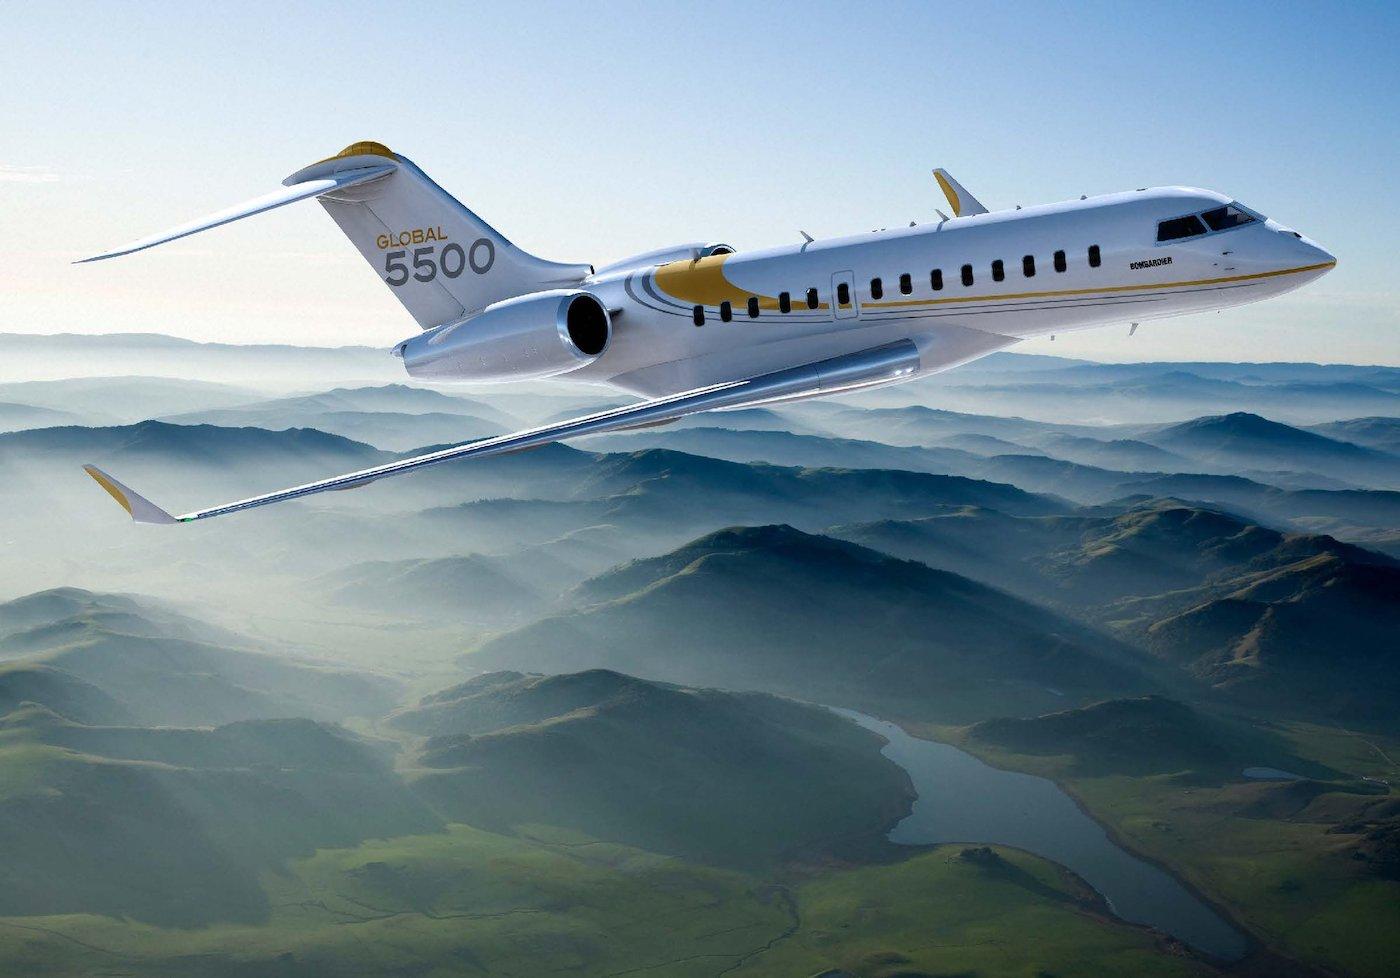 Bombardier Goblal 5500